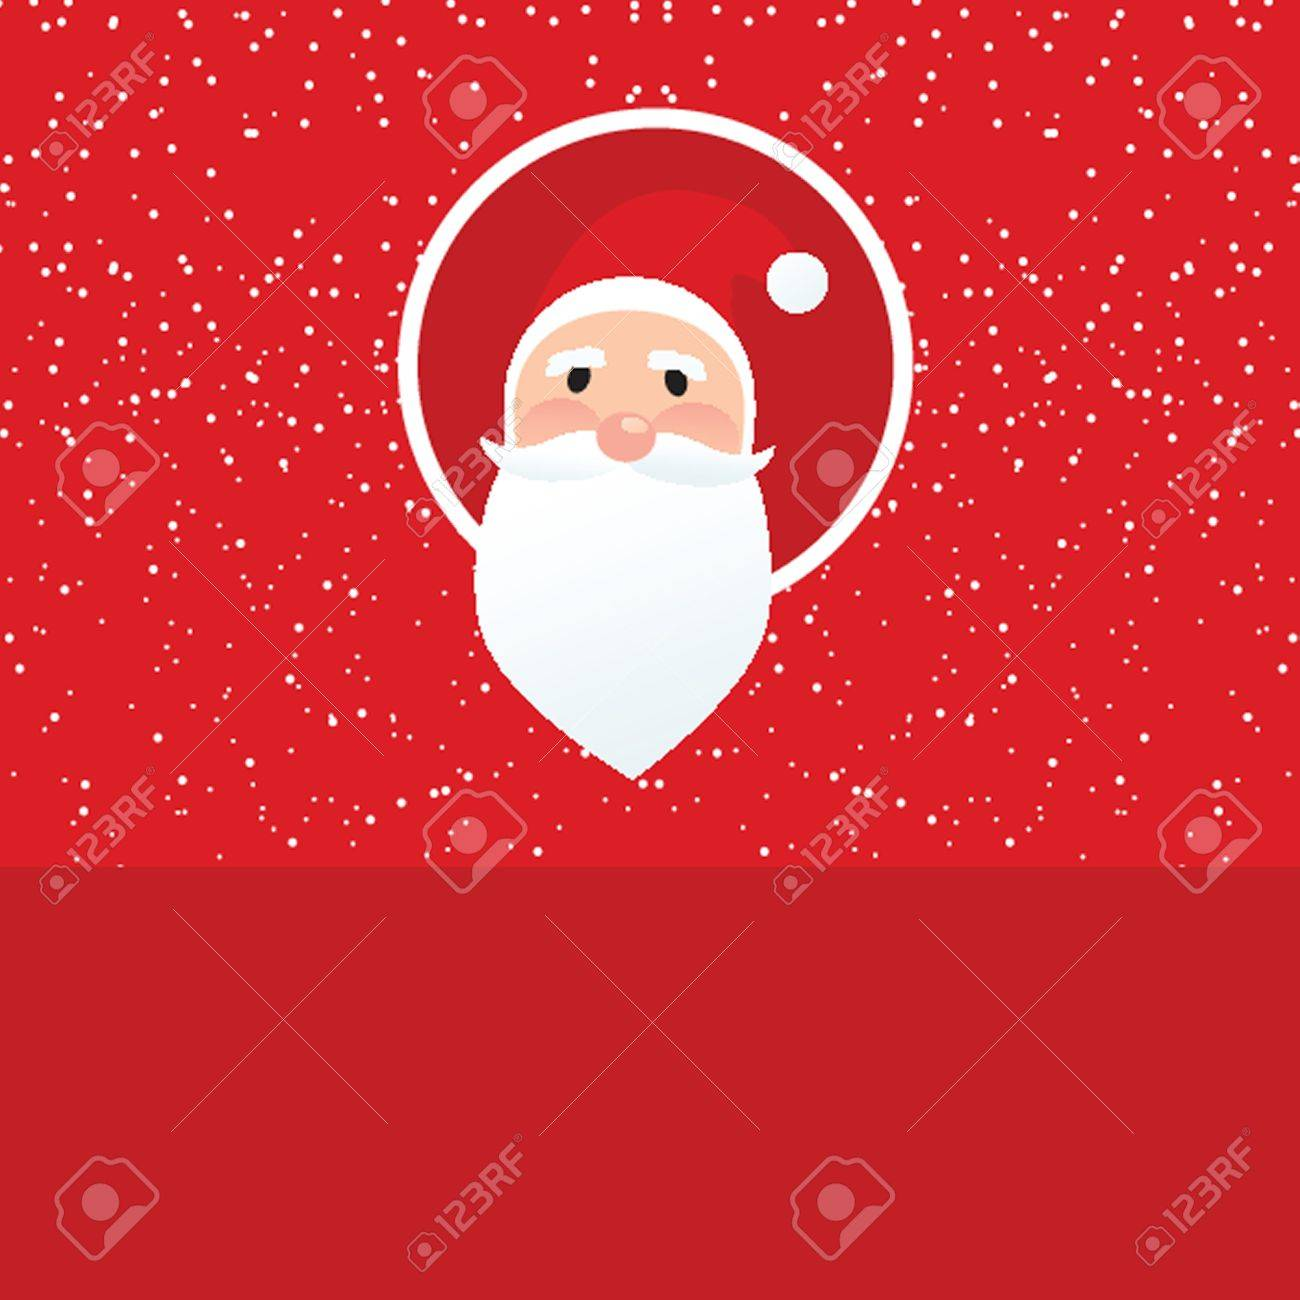 Christmas card with Santa Klaus face Stock Vector - 19093521